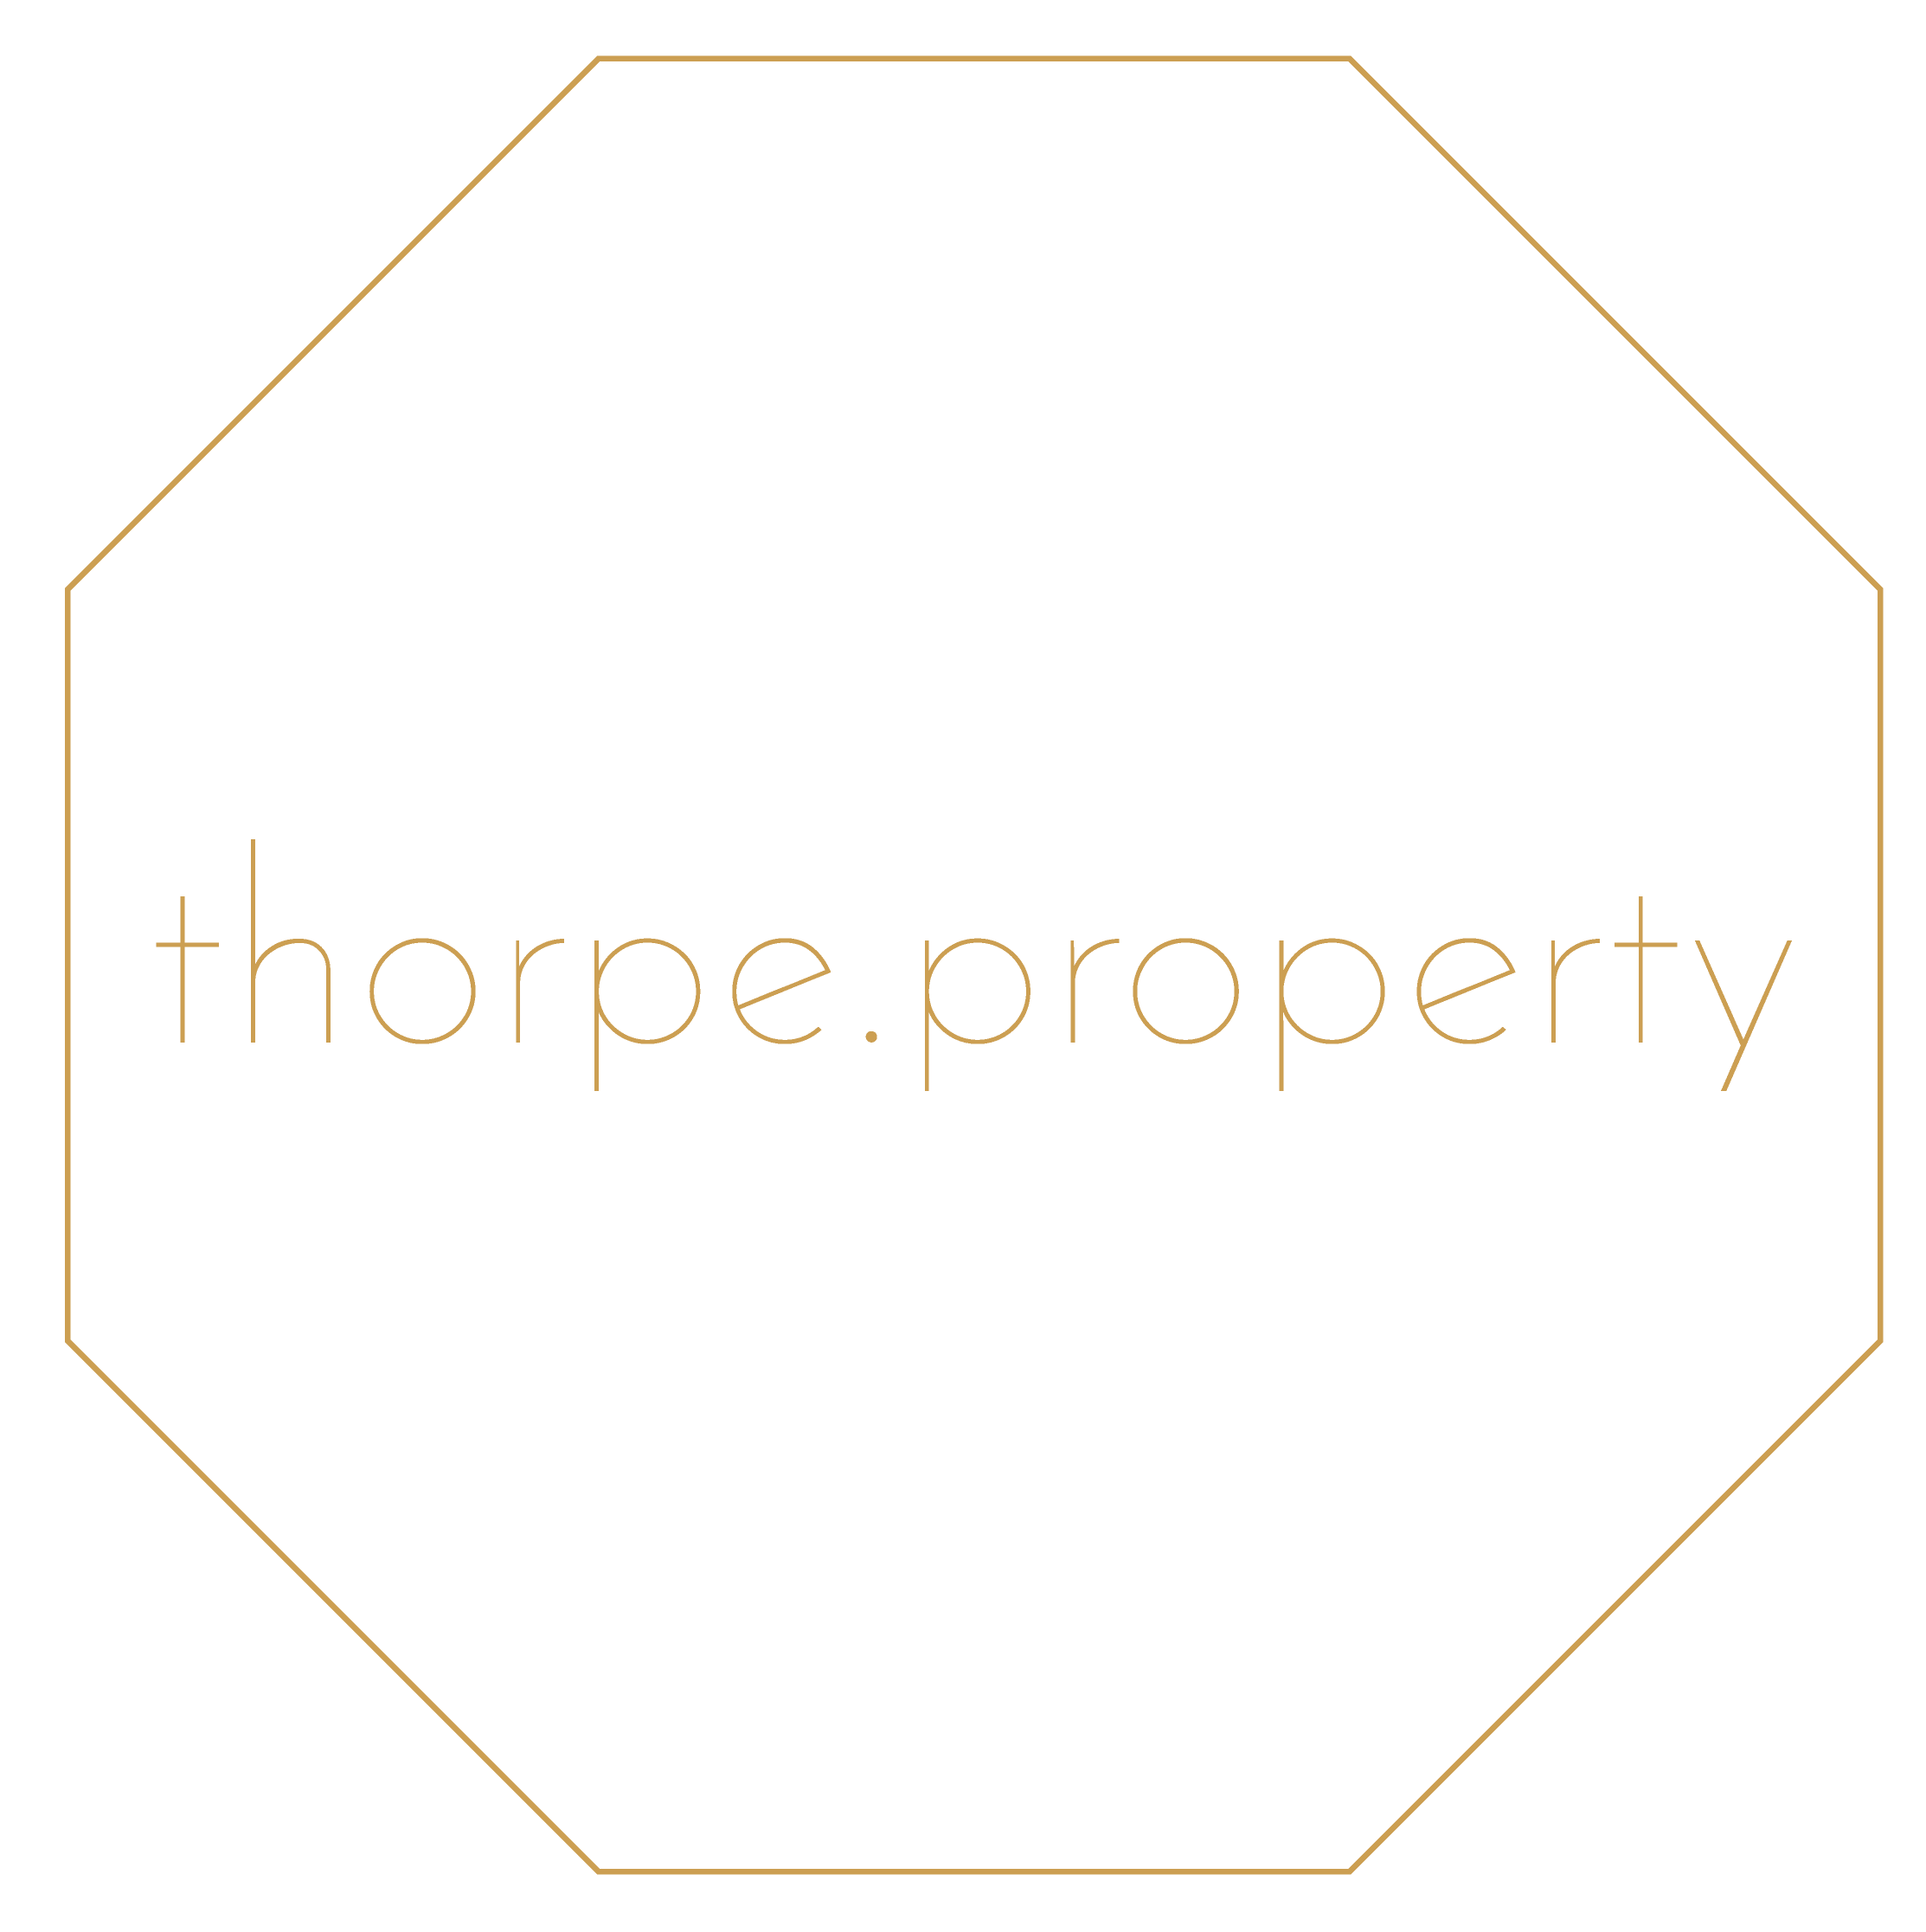 thorpe group logosArtboard 1 copy CROPPED.png